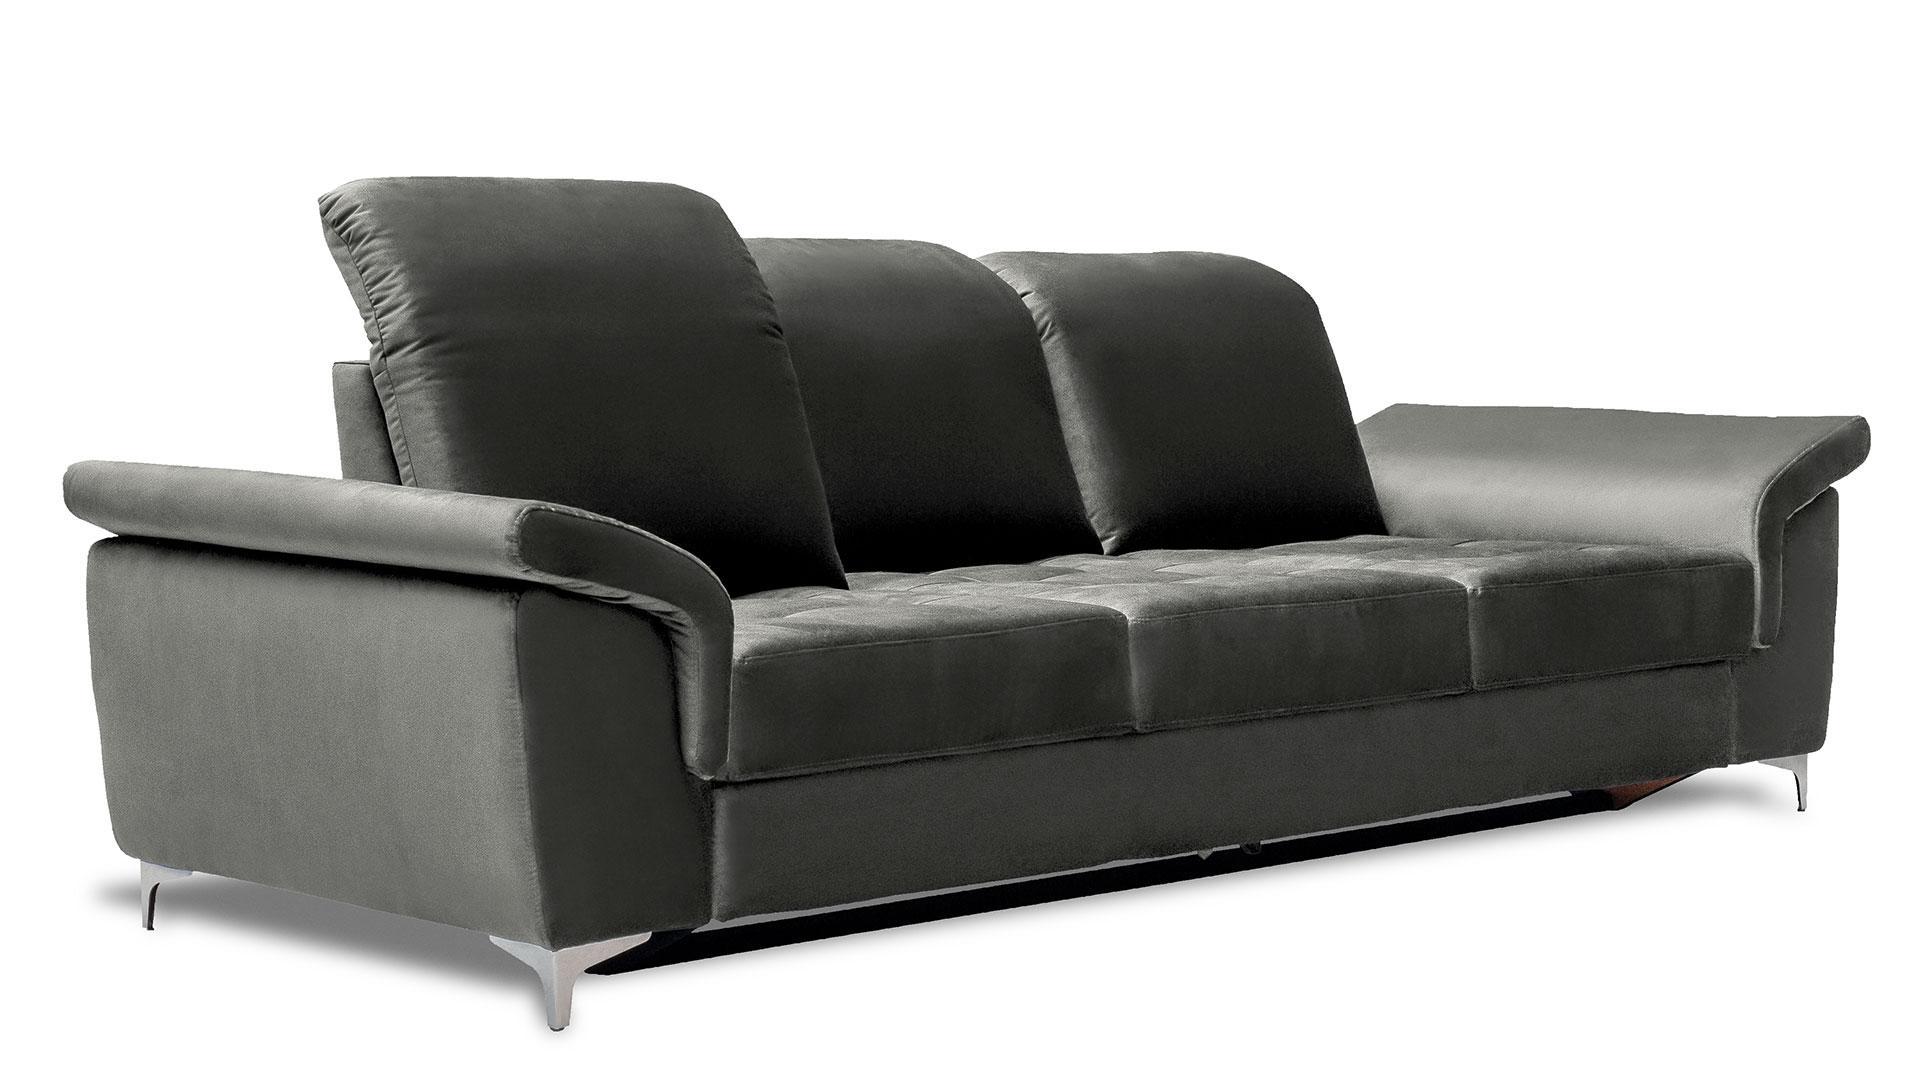 Sofa with sleeping function